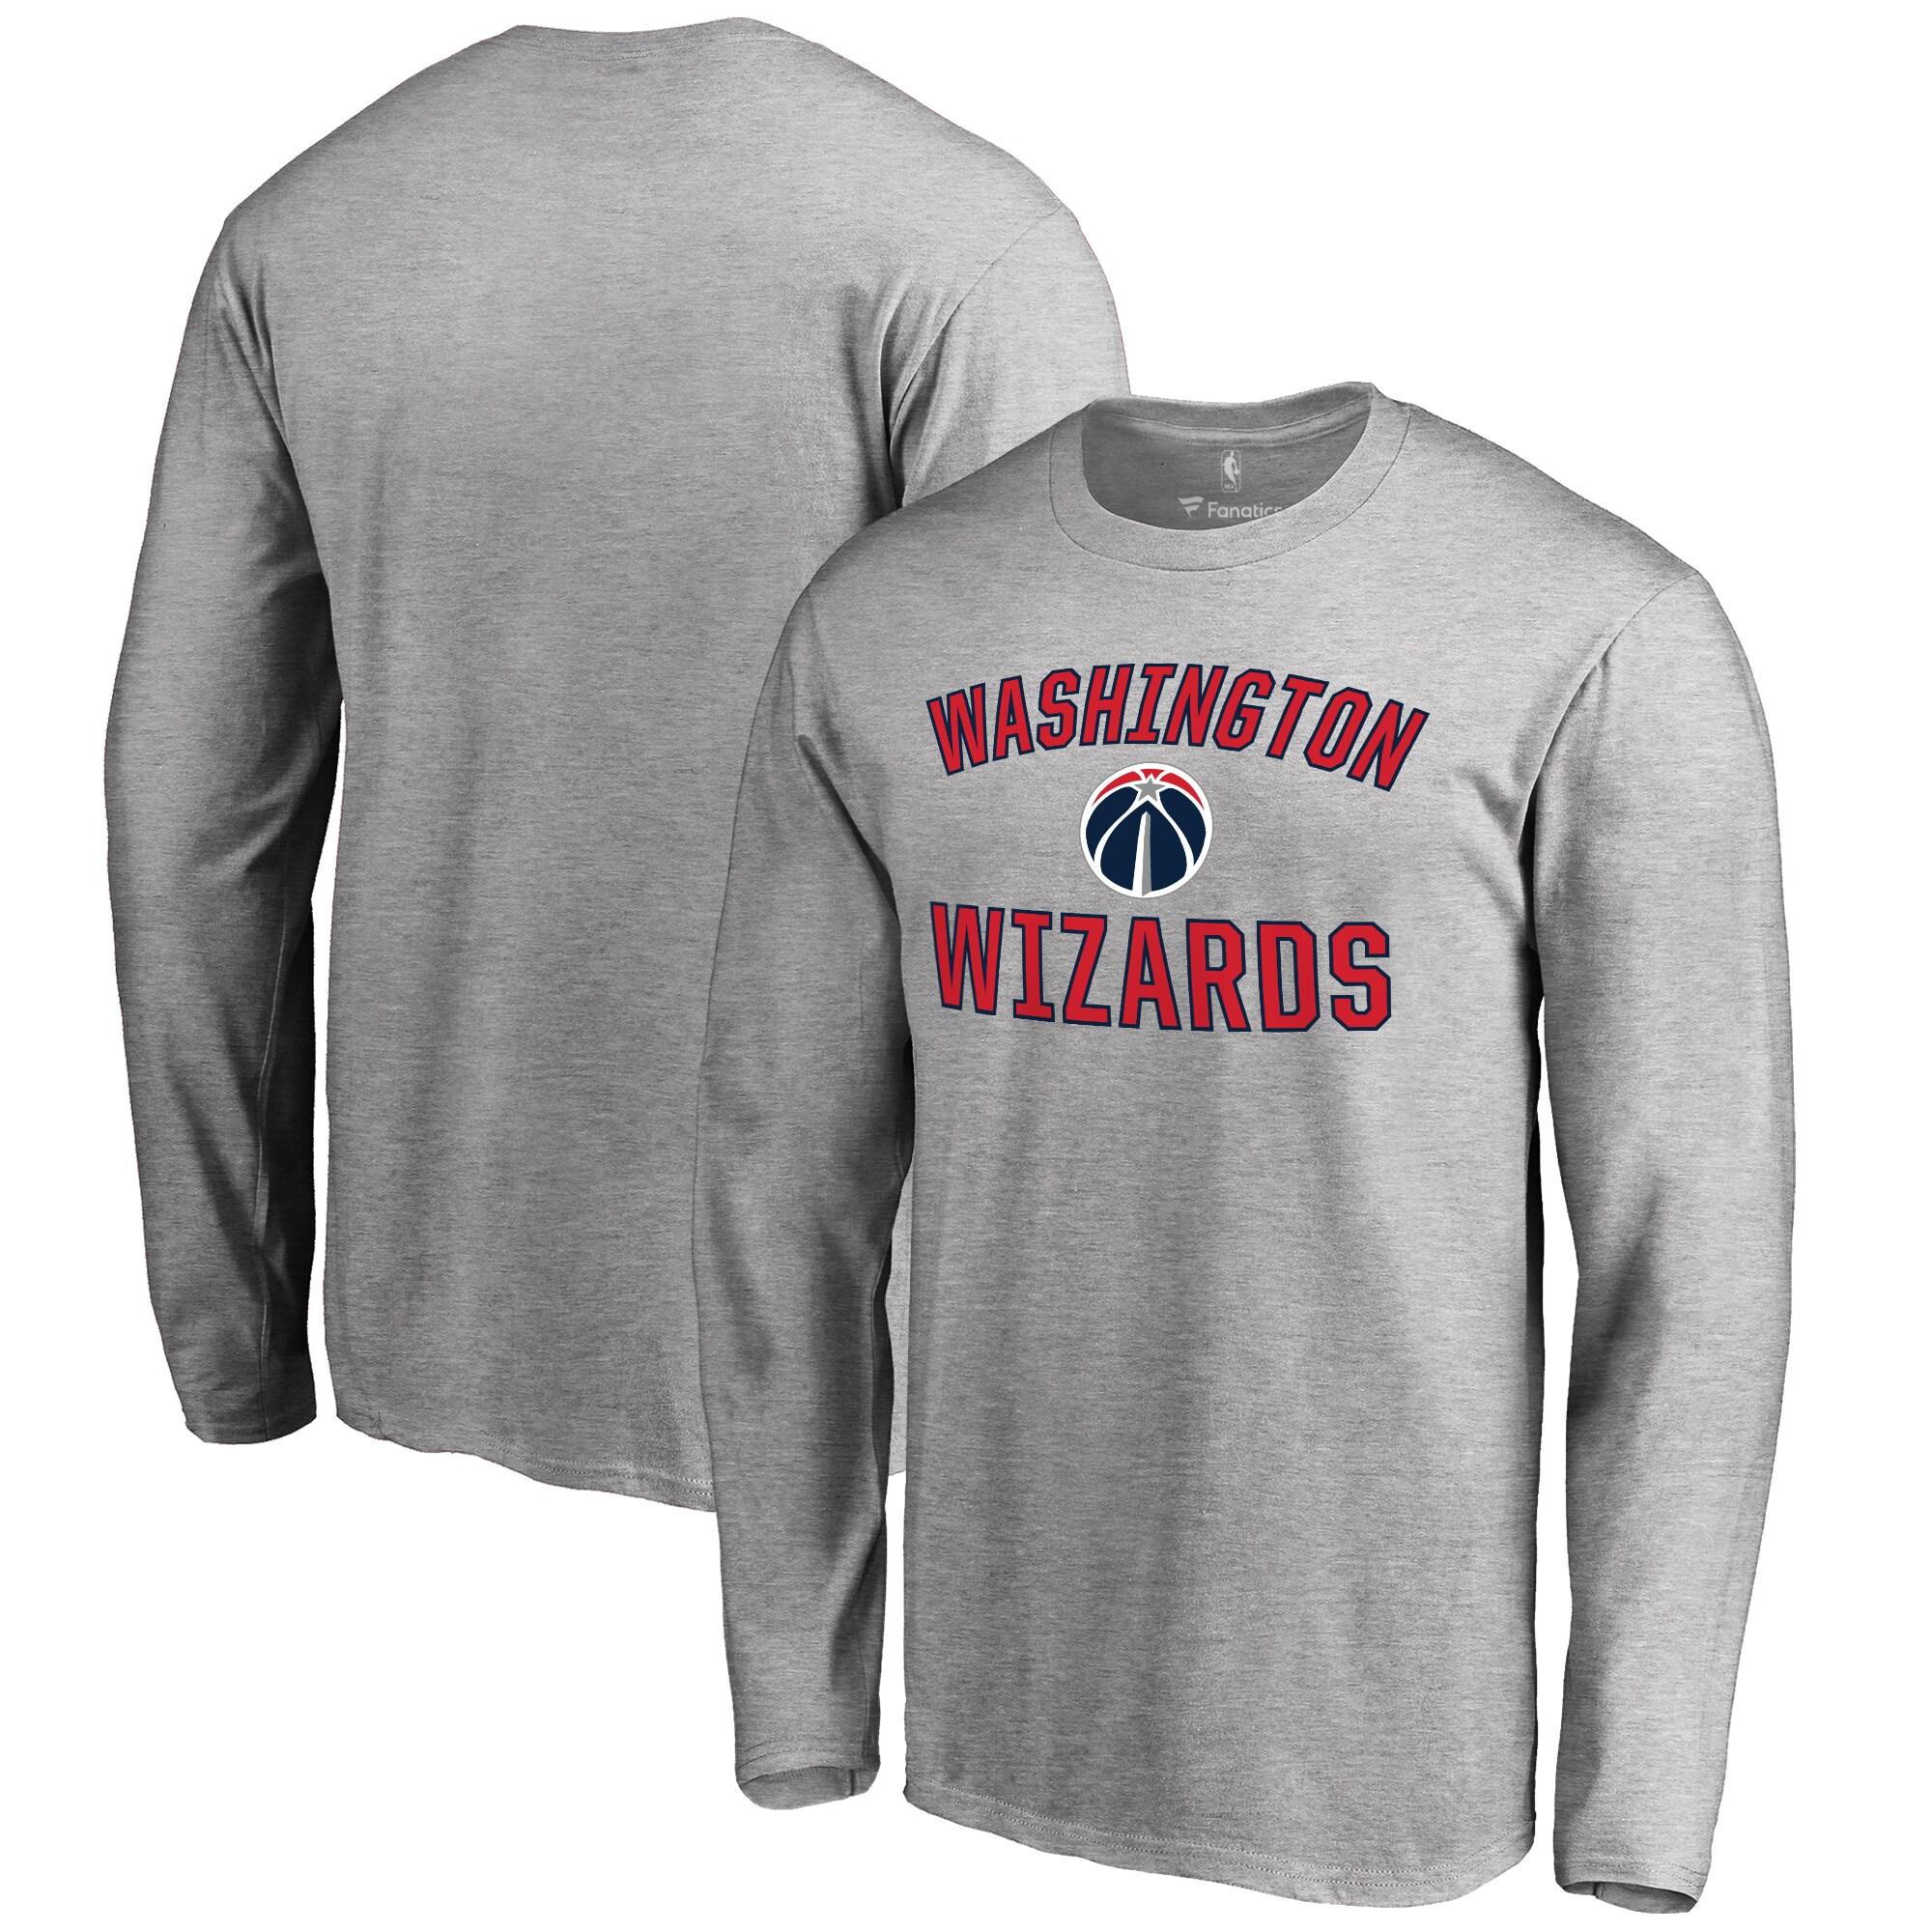 Washington Wizards Victory Arch Long Sleeve T-Shirt - Ash